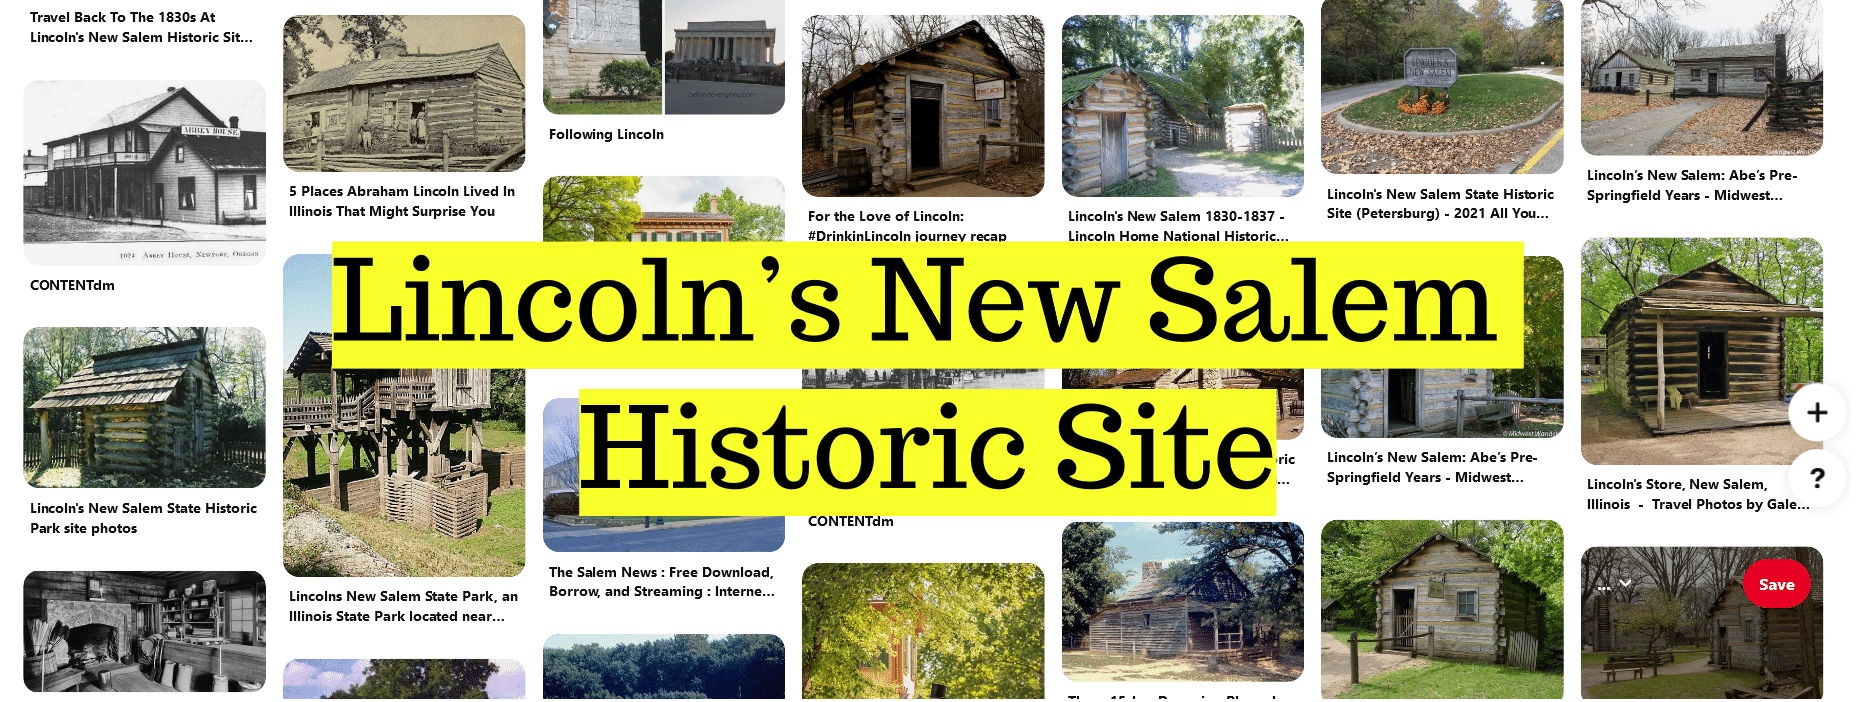 Lincoln's New Salem Historic Site